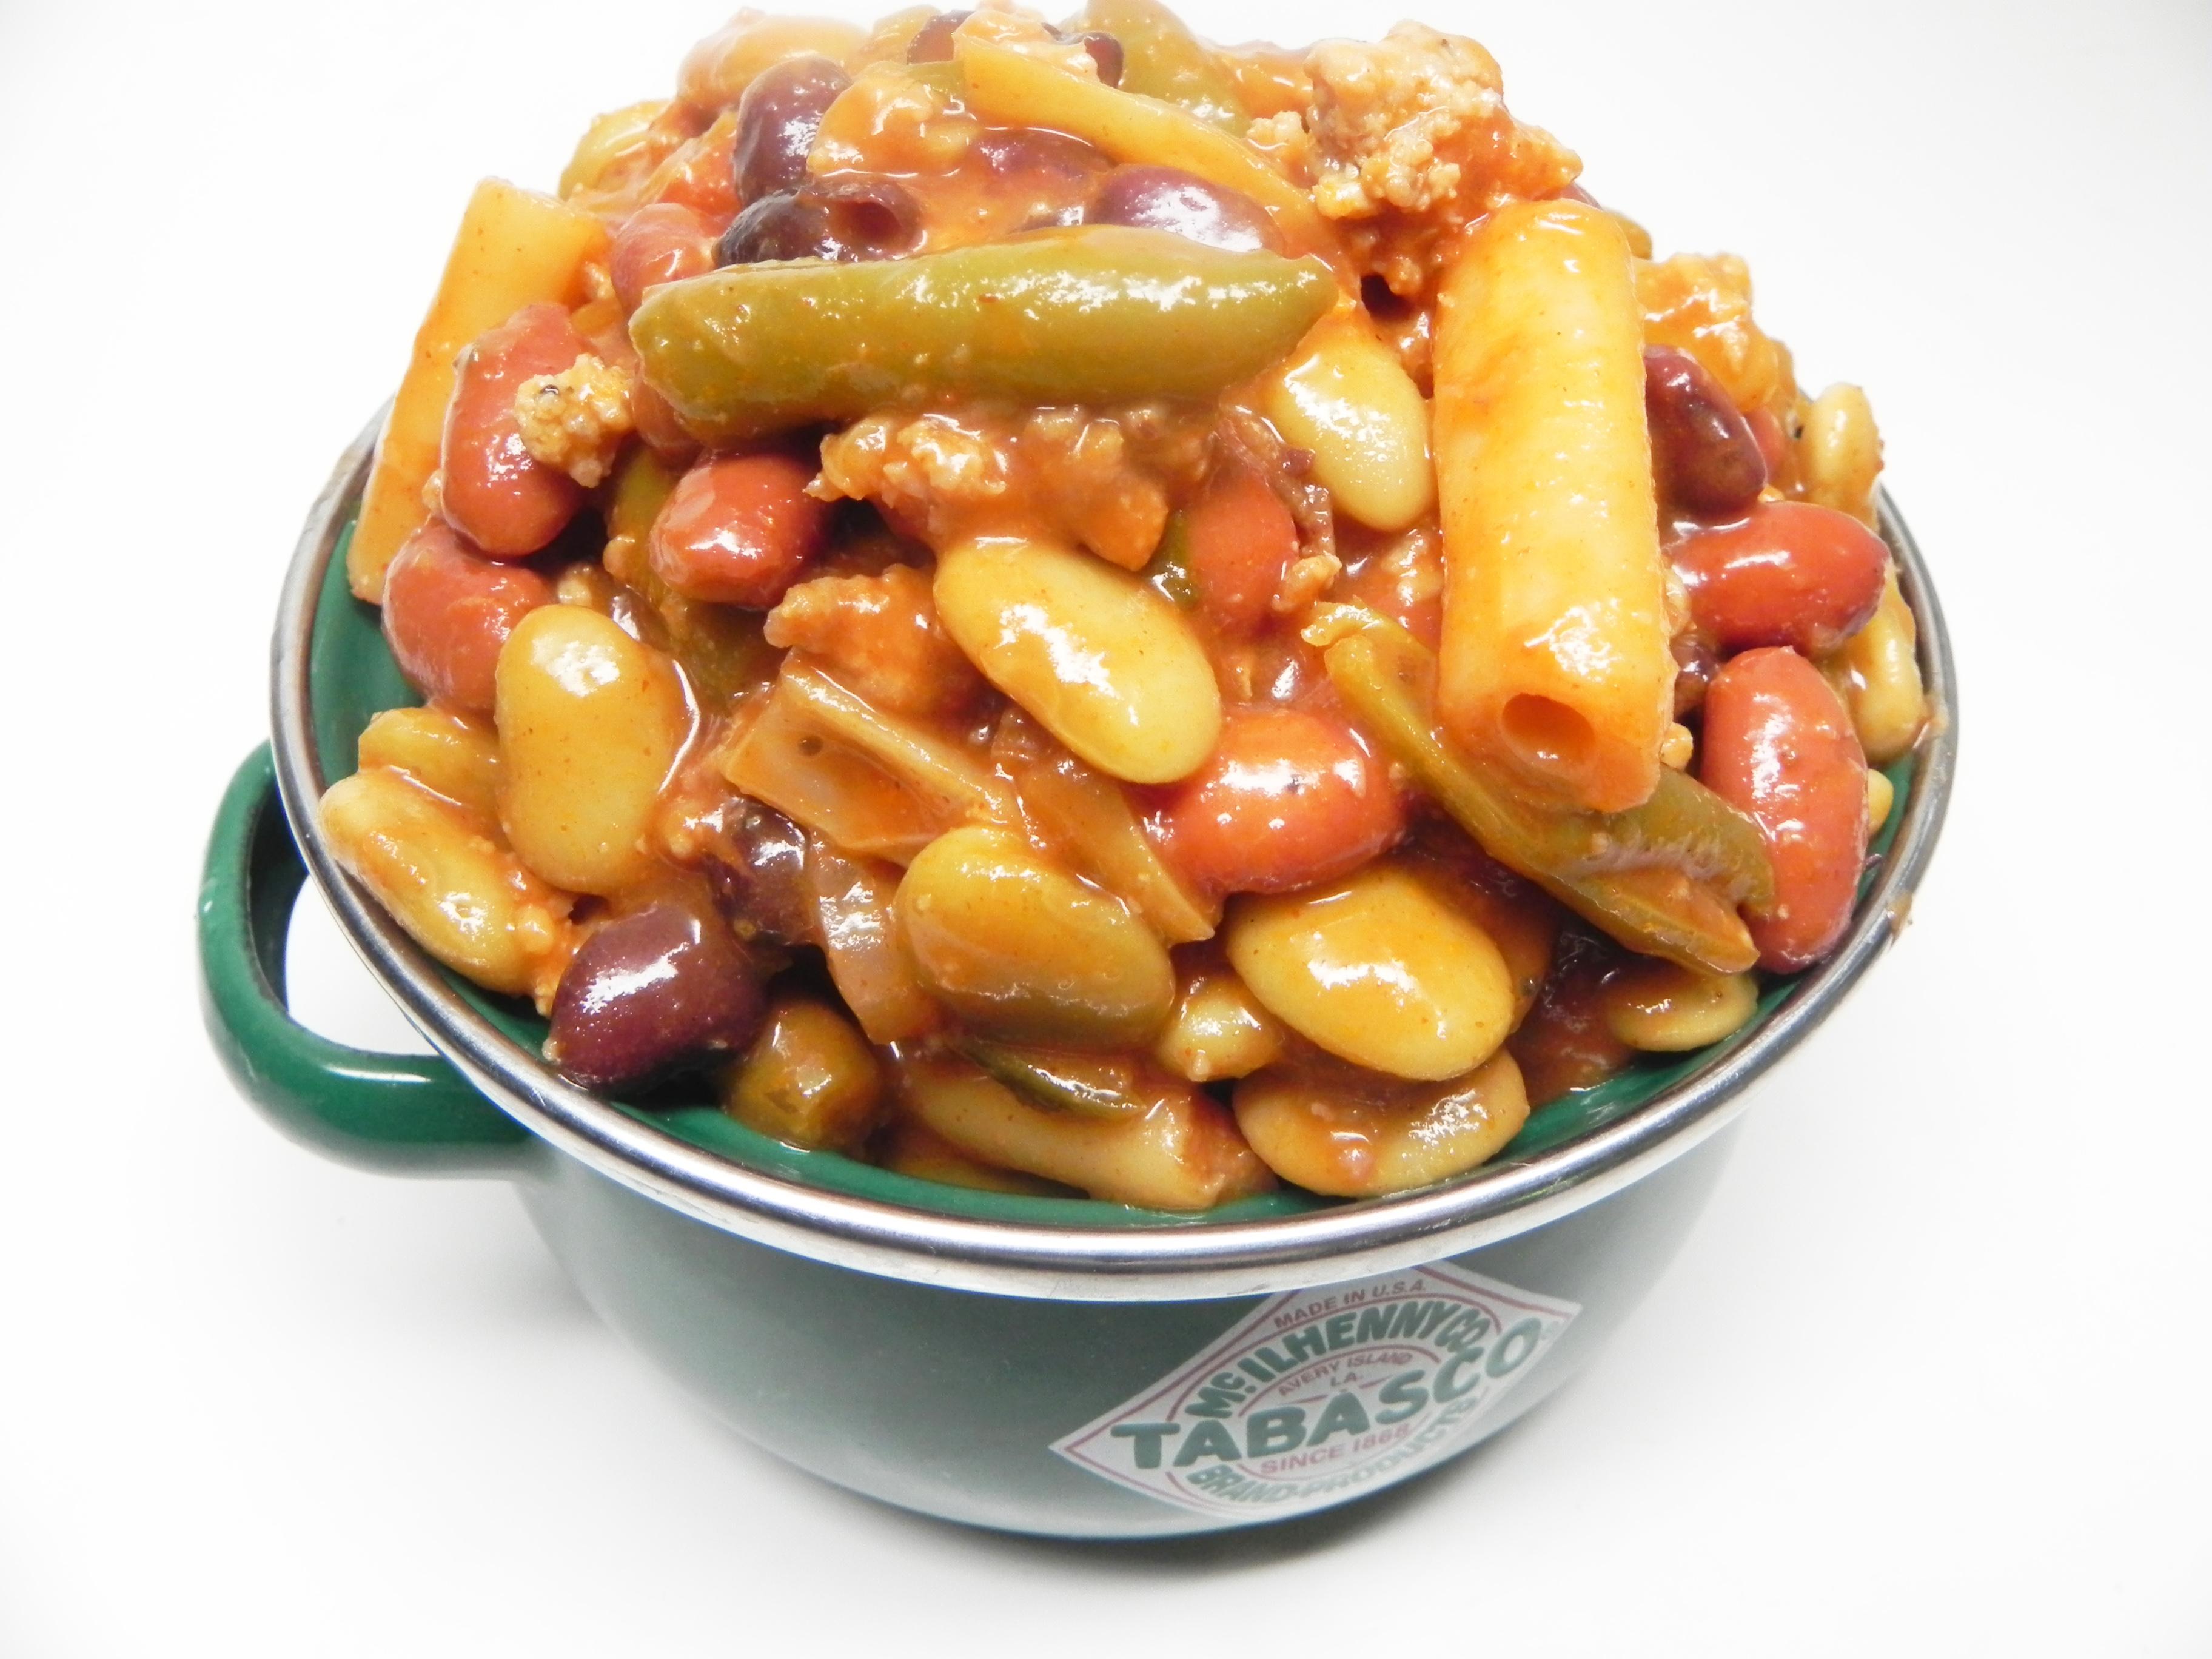 Bandito Beans